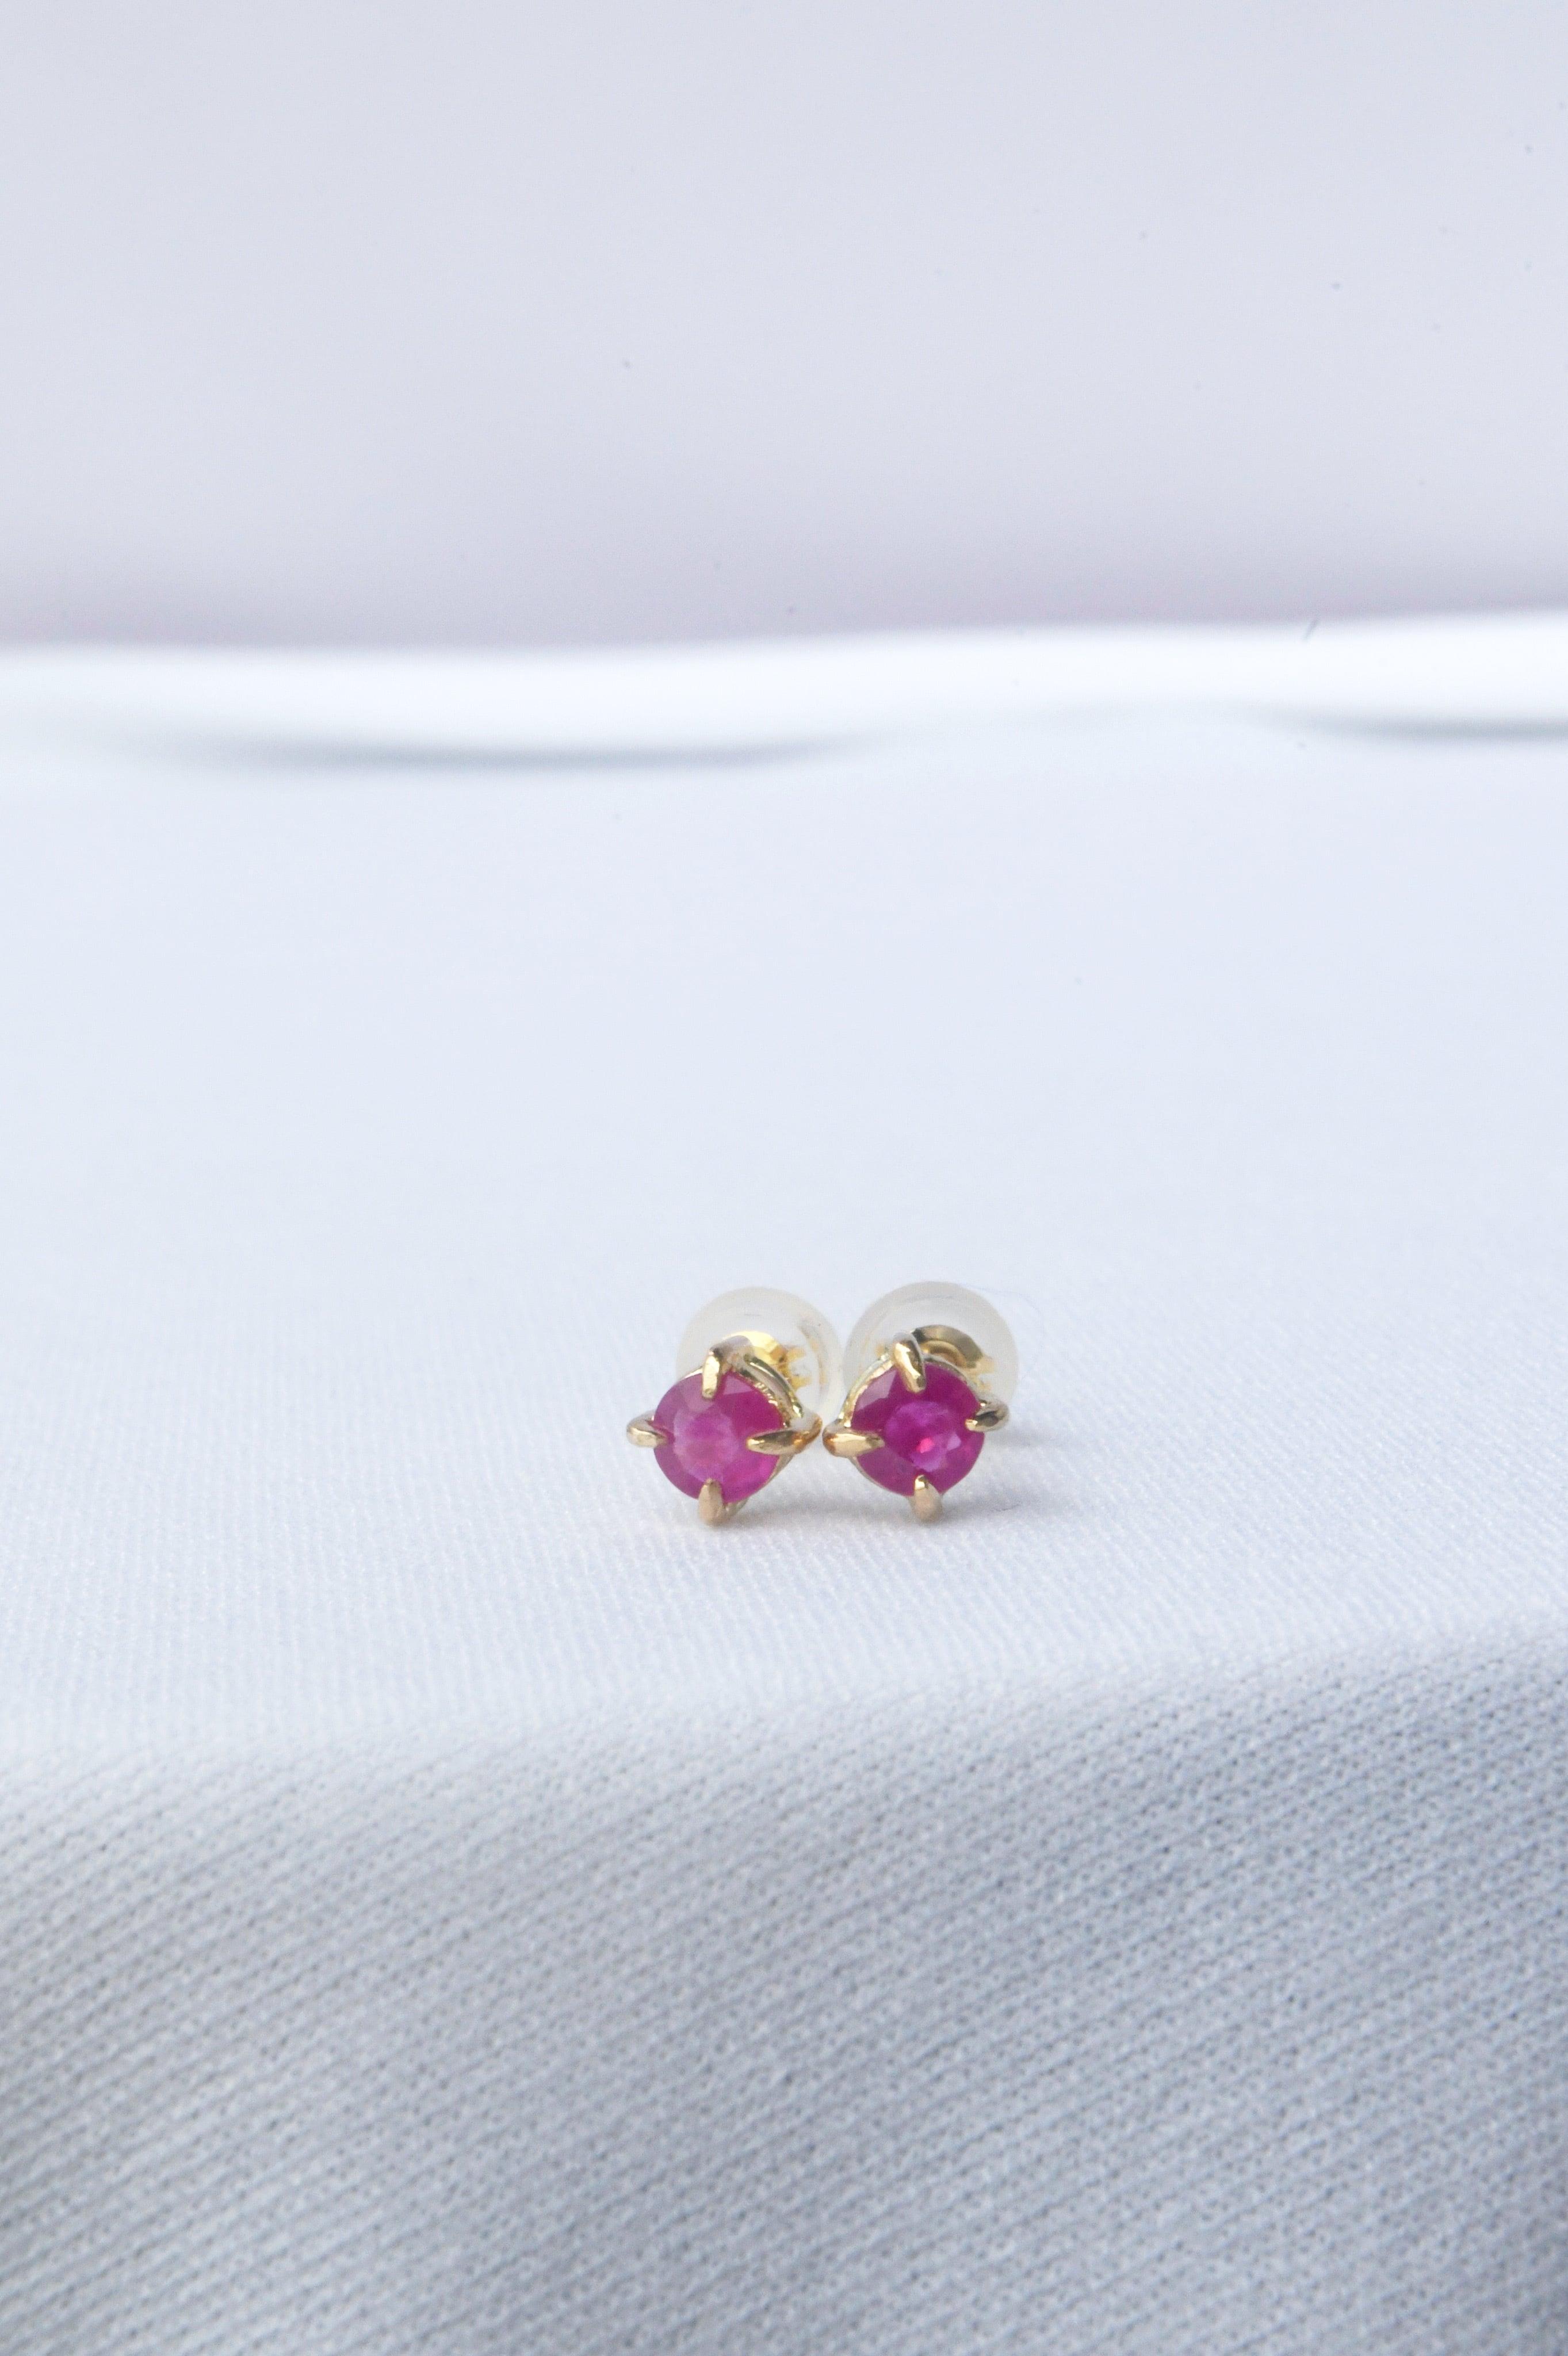 K18 Myanmar Ruby Studs Earrings 18金ミャンマー産ルビースタッズピアス